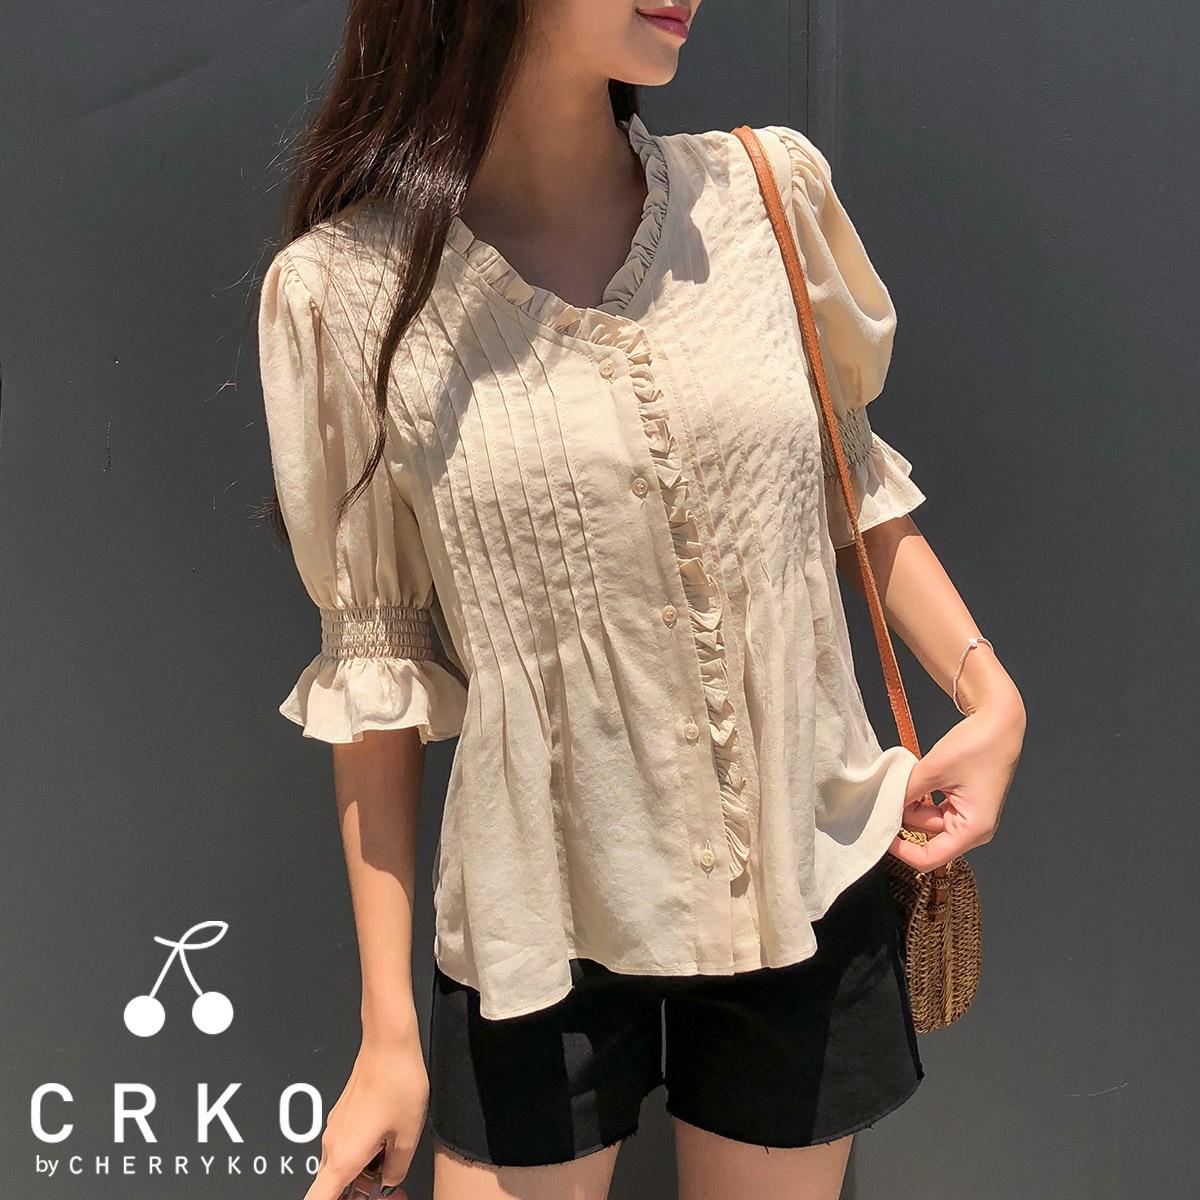 [CHERRYKOKO官方旗艦店] V領襯衫 / model cuer blouse